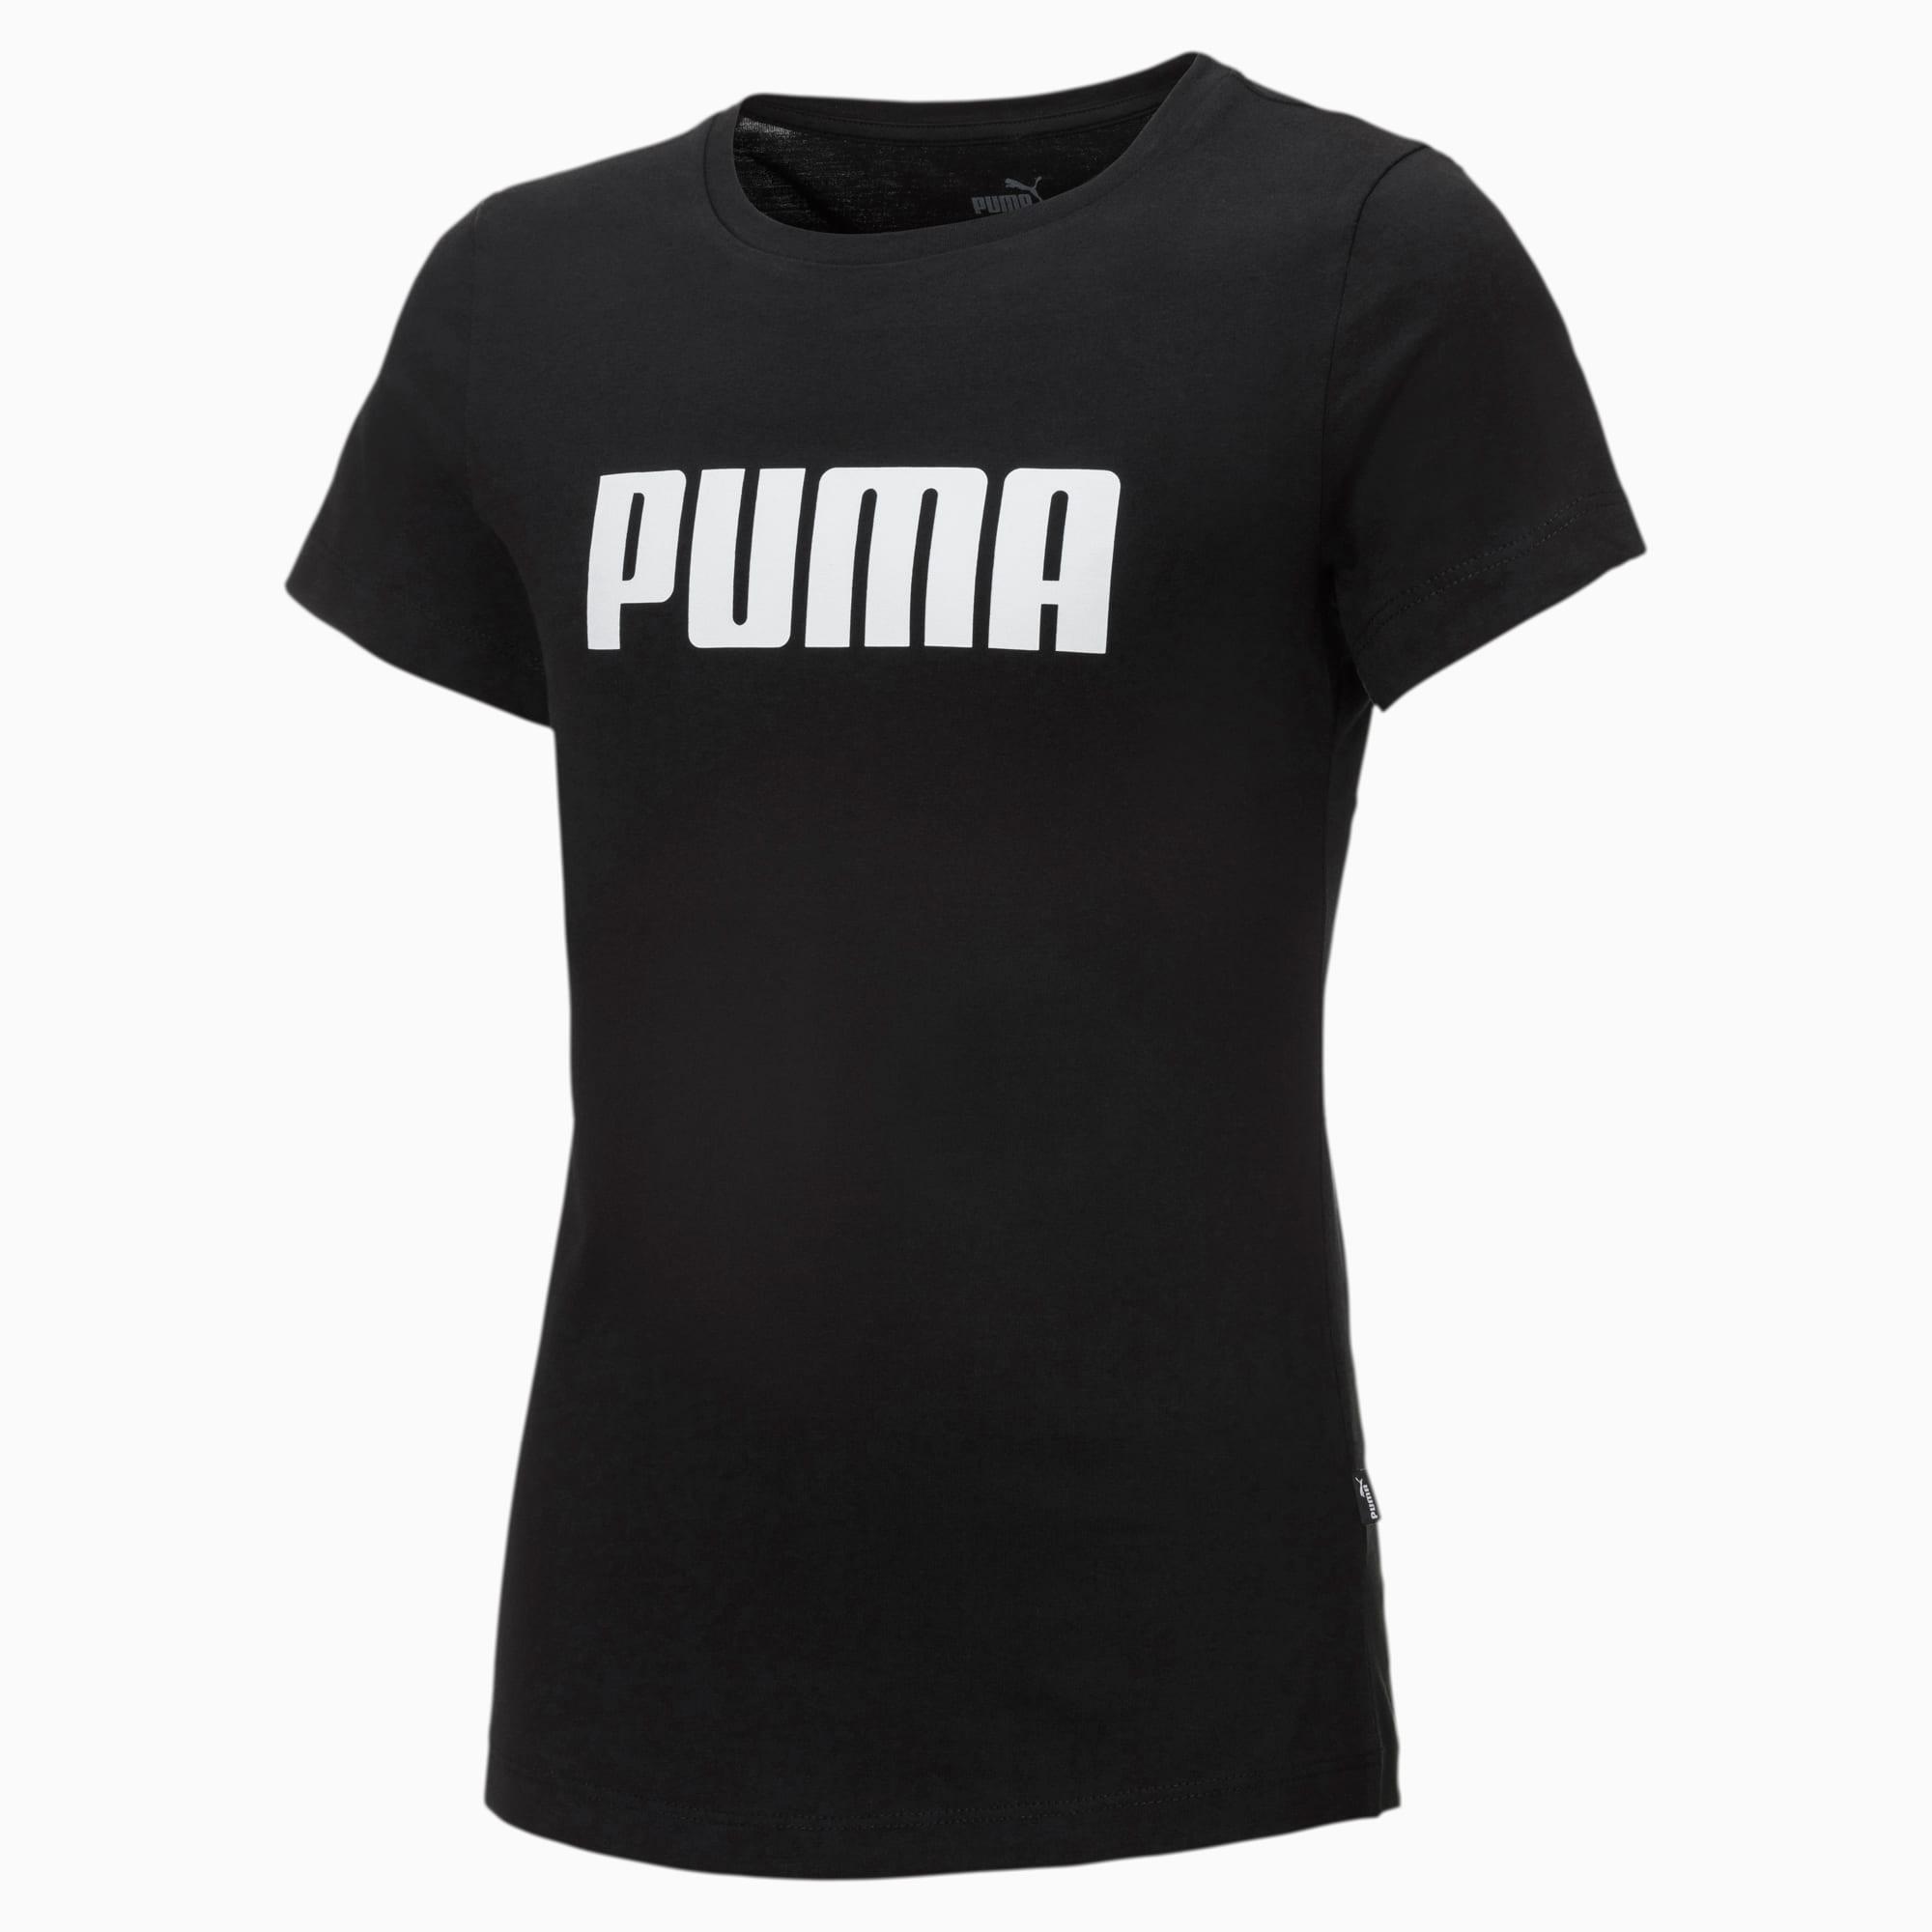 Essentials T-shirt meisjes, Zwart, Maat 104 | PUMA